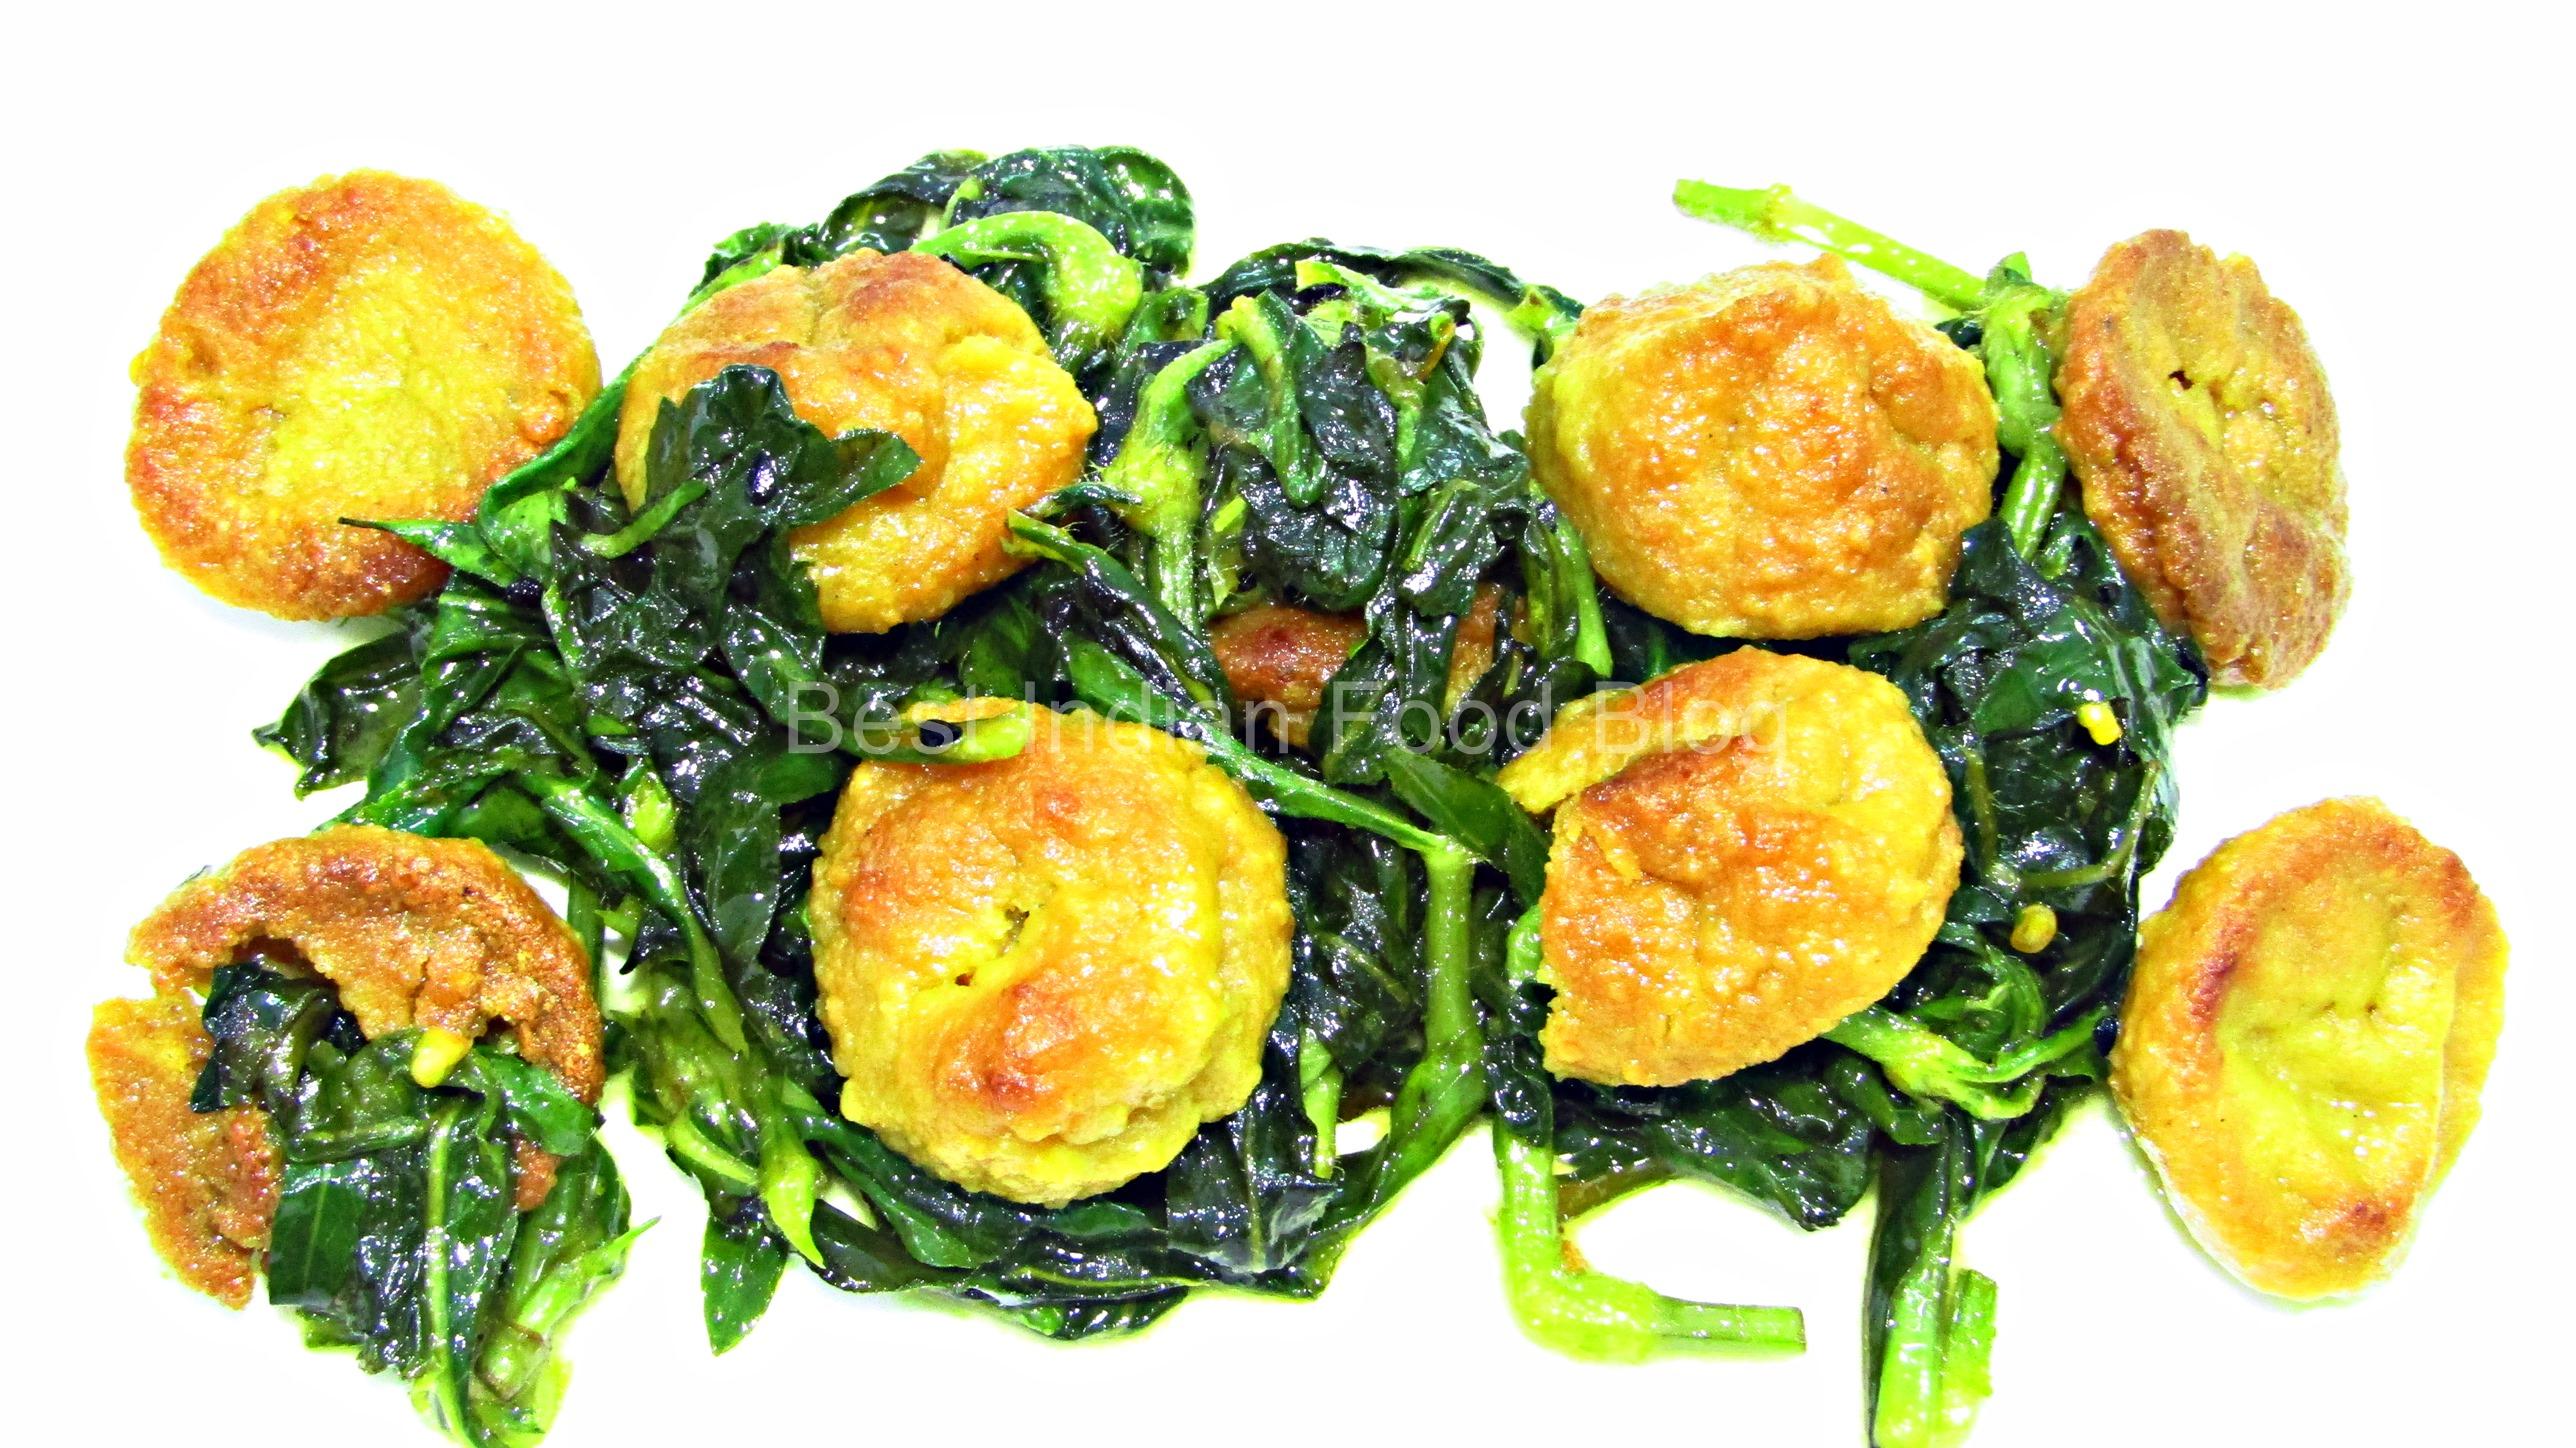 Kulekhara Bori from West Bengal, India | Best Indian Food Blog | Indian Swampweed Bori recipe